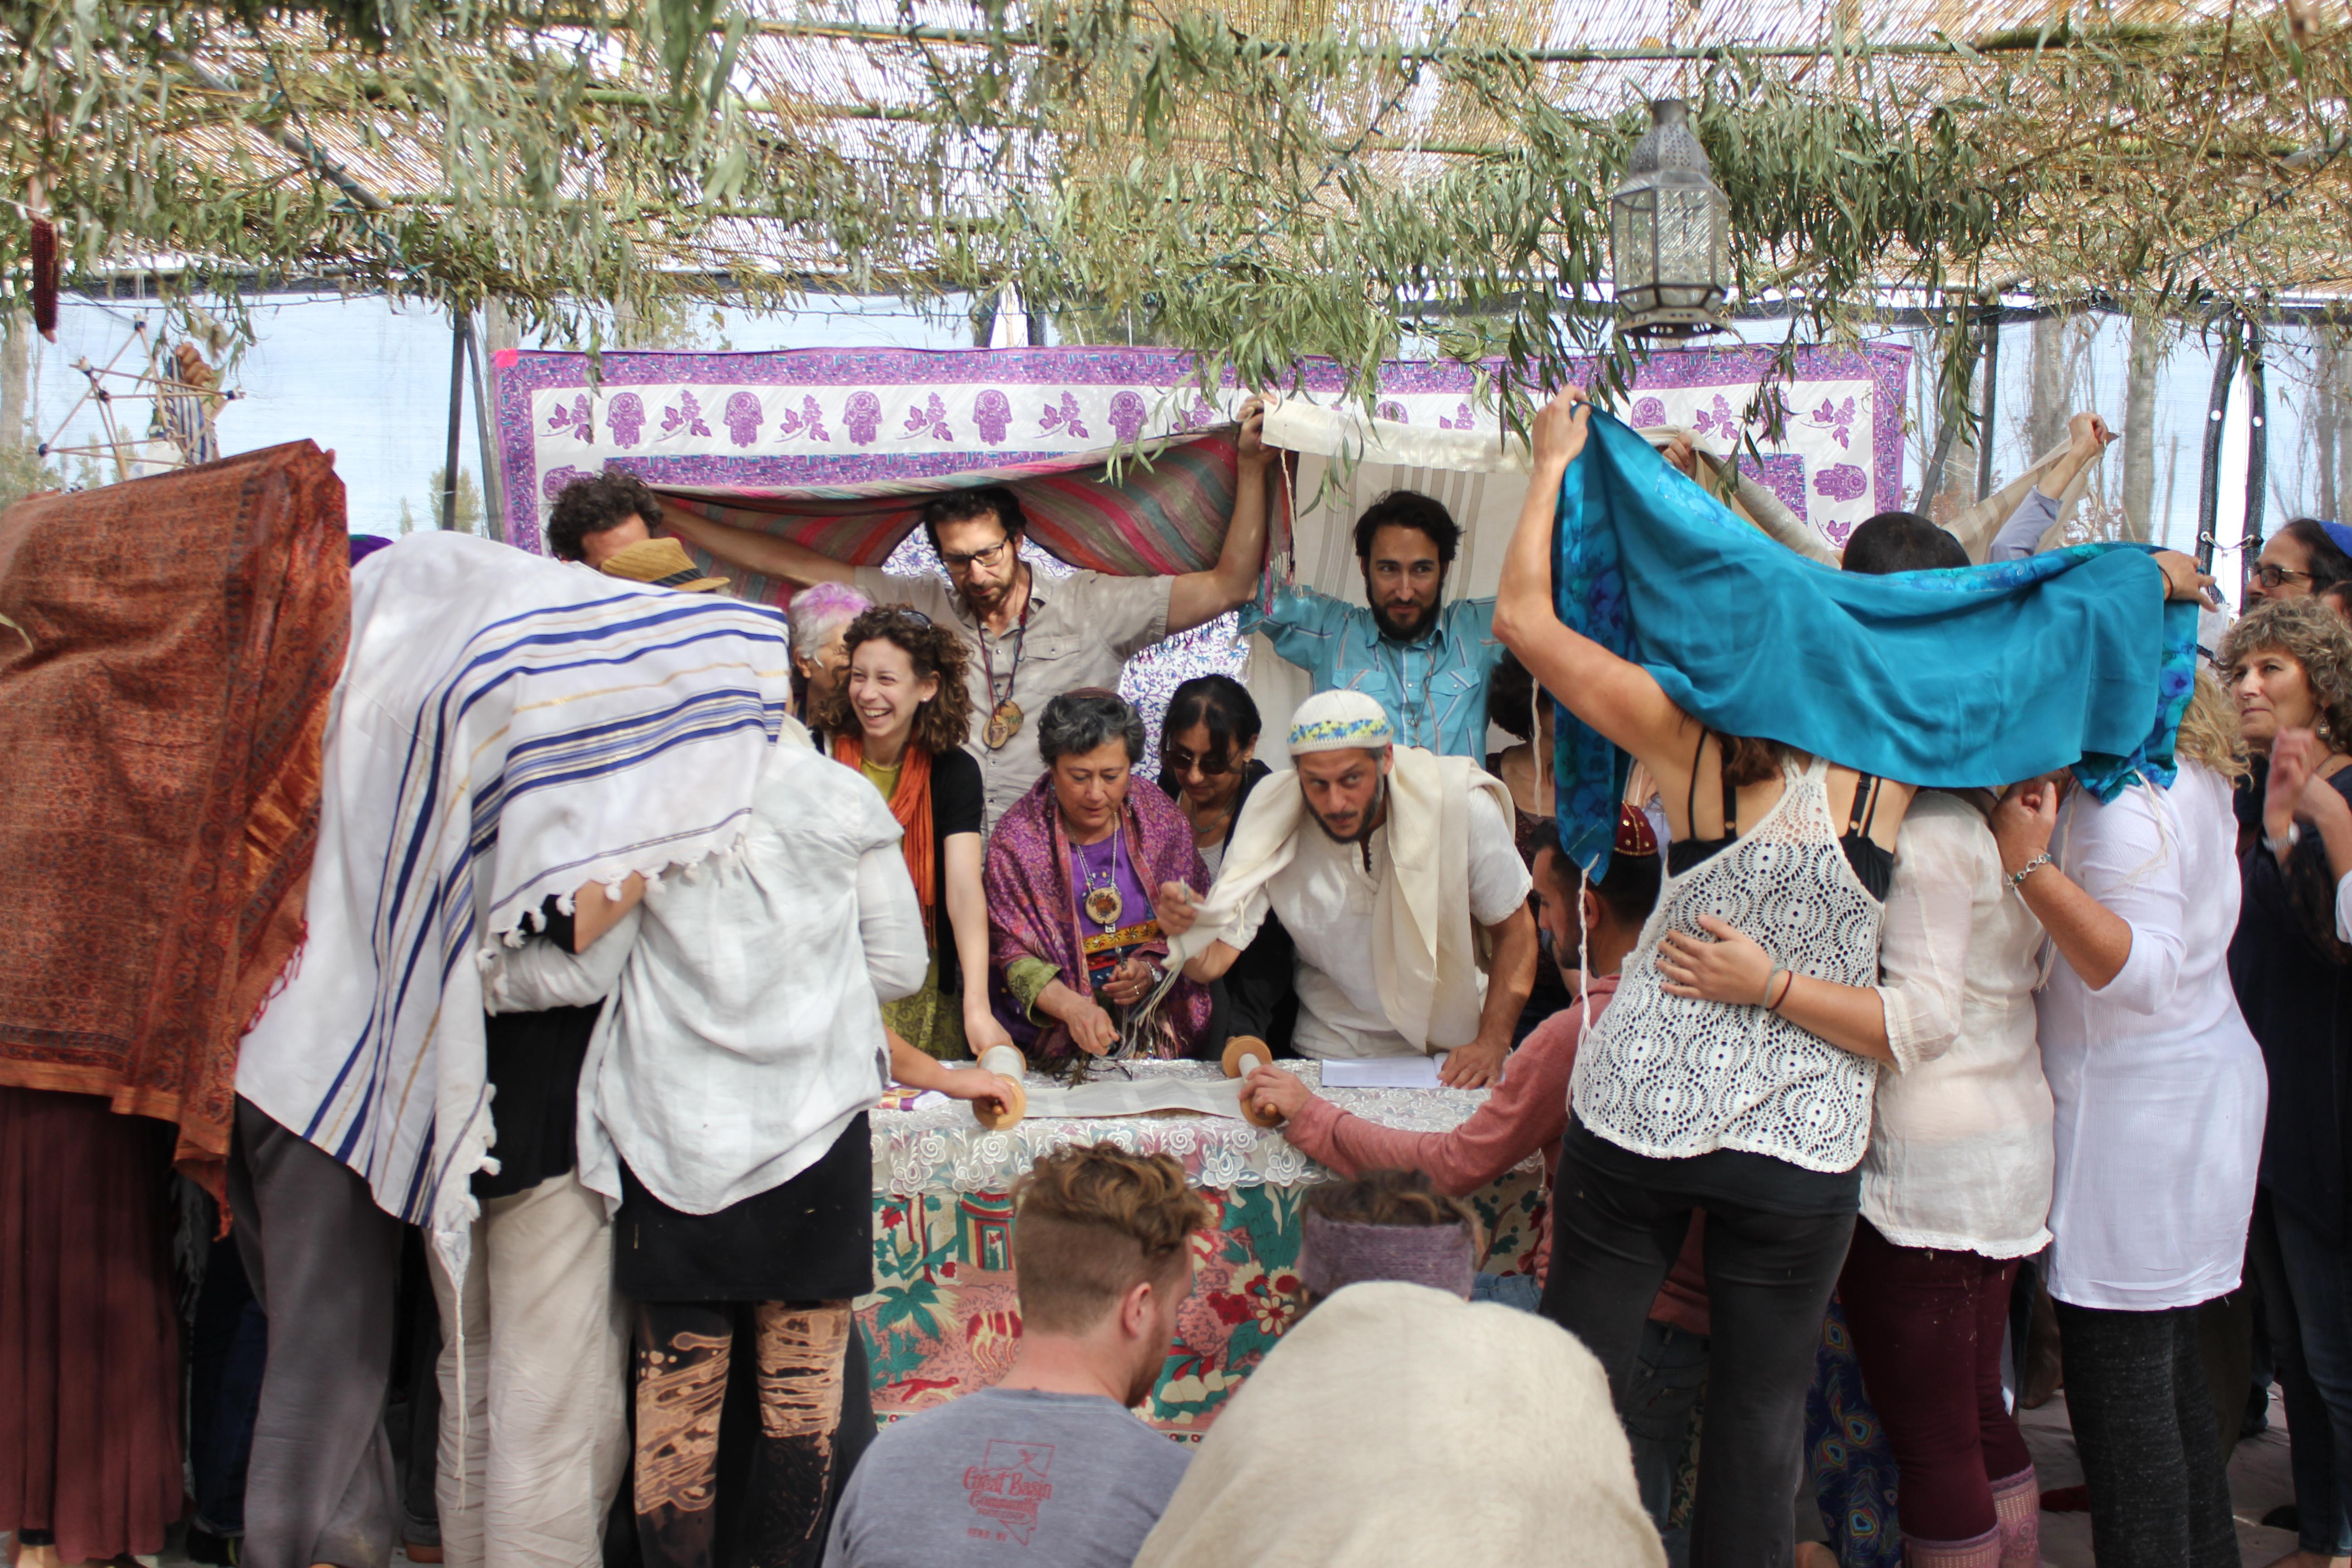 a group of people gather around a torah scroll under a lark sukkah